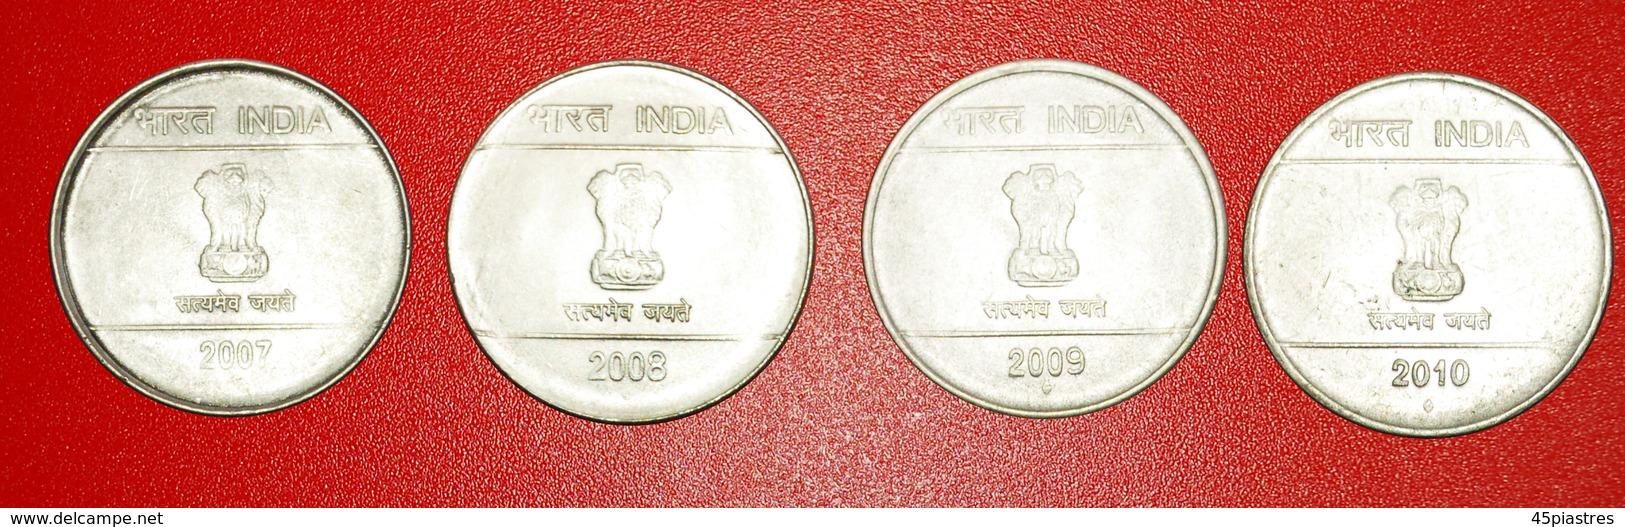 + 4 COINS SET OF SHIKHARA MUDRA: INDIA ★ 1 RUPEE 2007-2010! LOW START ★ NO RESERVE! - Kilowaar - Munten